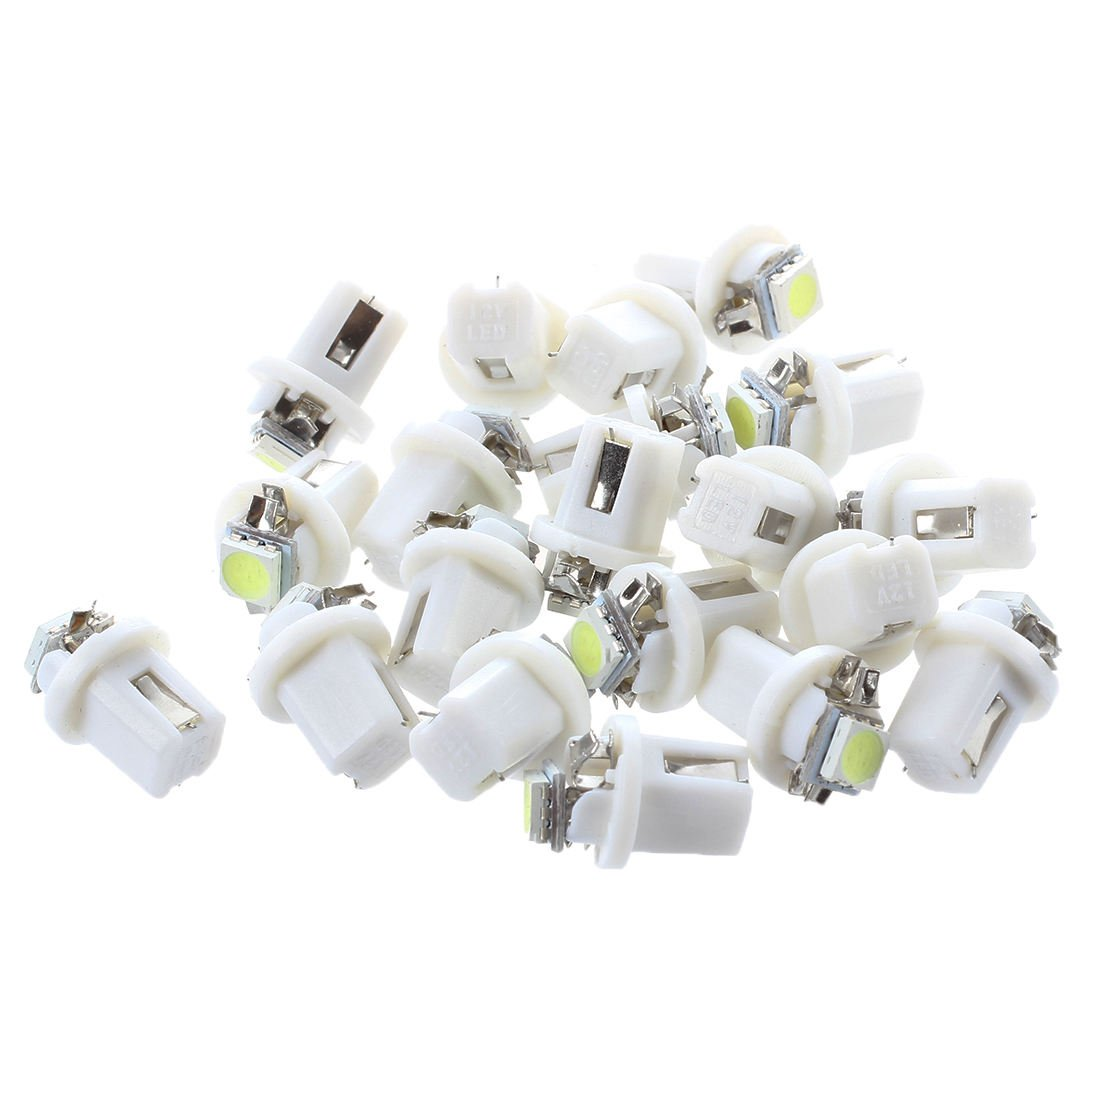 LED Indicator Light - SODIAL(R) 20X T5 B8.5D SMD 5050 Car LED Indicator Light C5W Side Interior Lamp Bulb White 062322